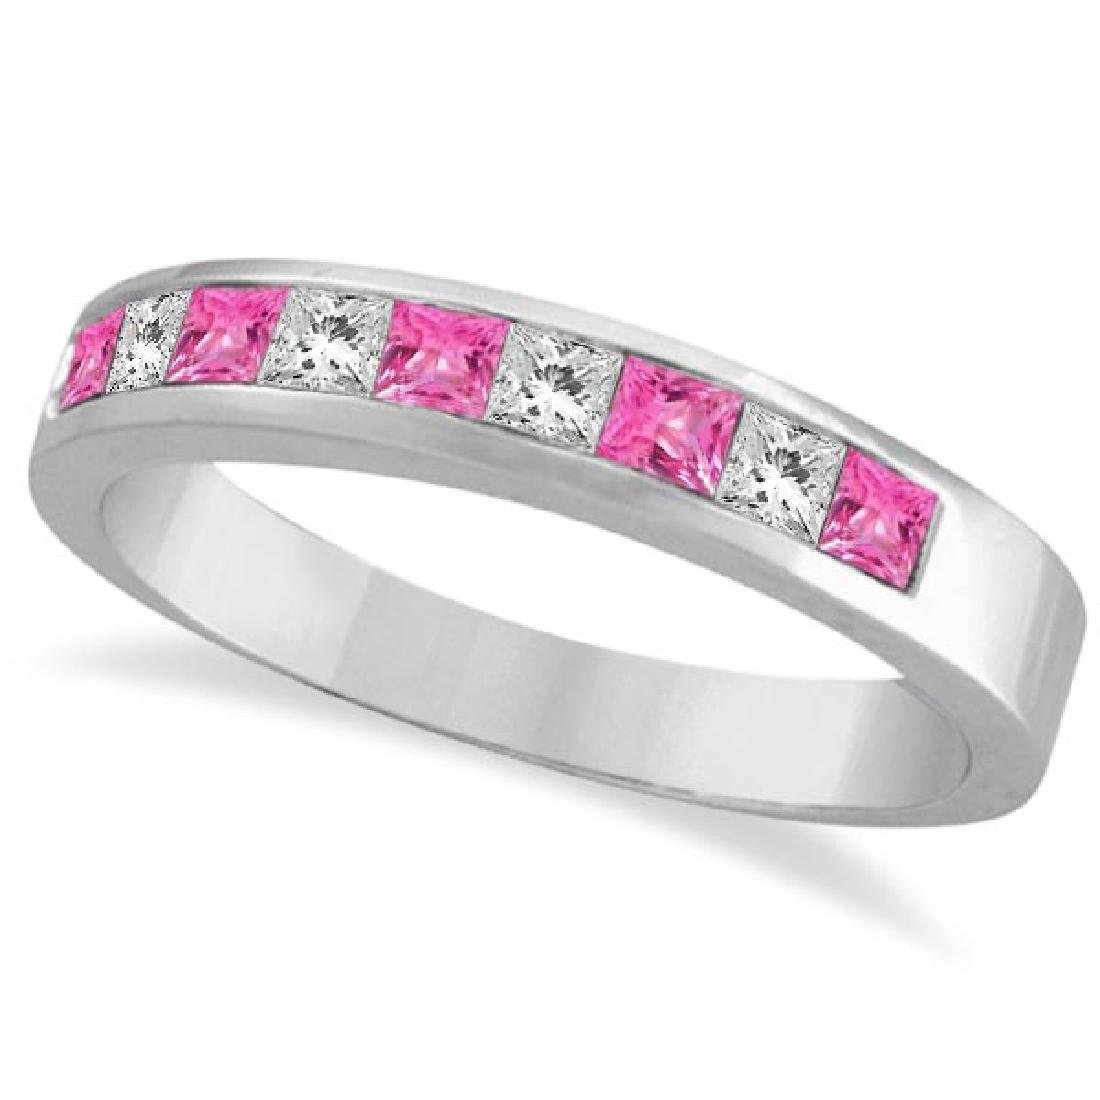 Princess Channel-Set Diamond and Pink Sapphire Ring Ban